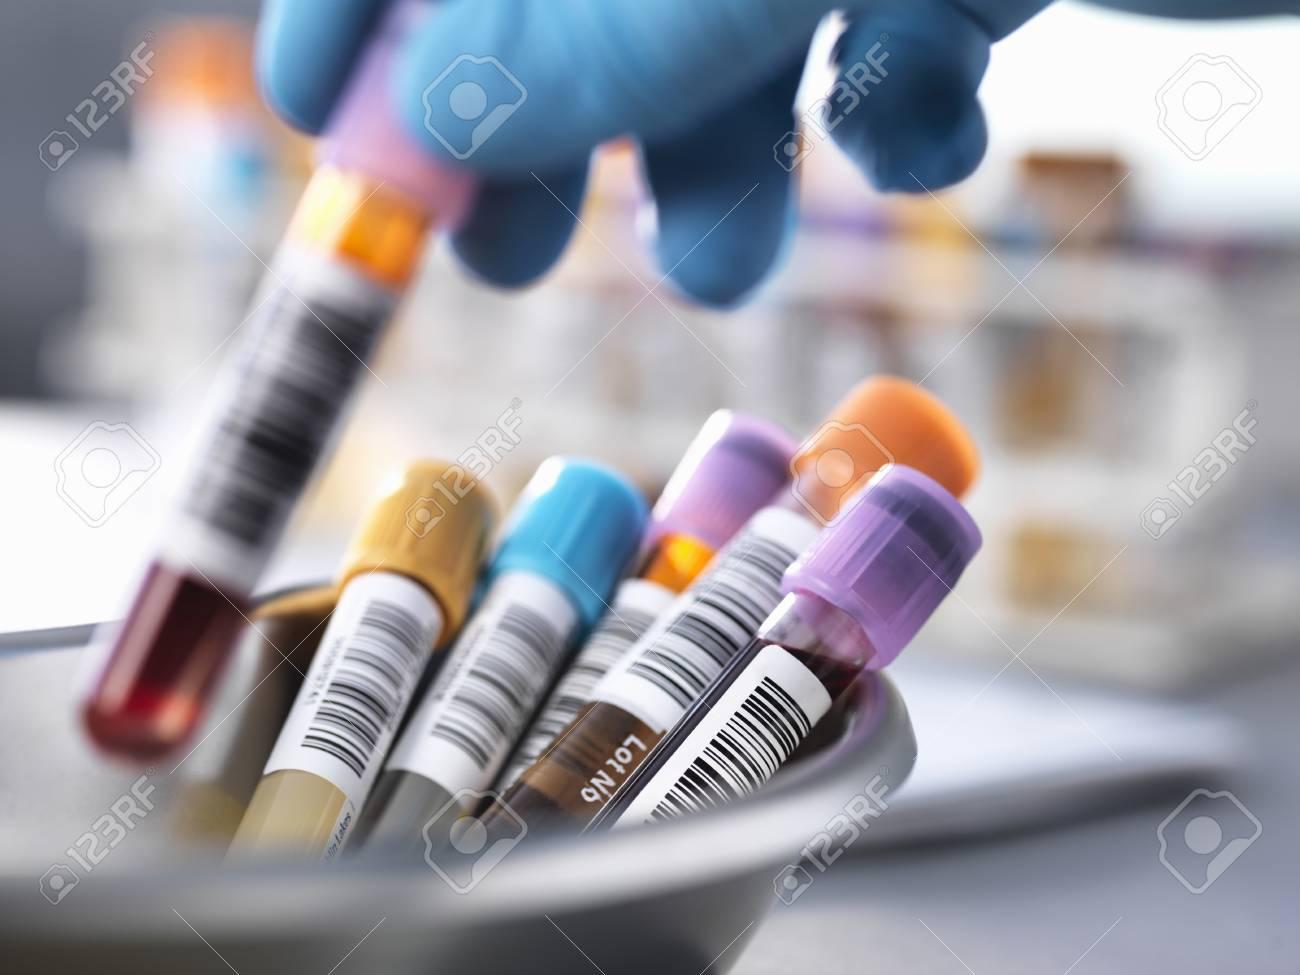 free tester samples